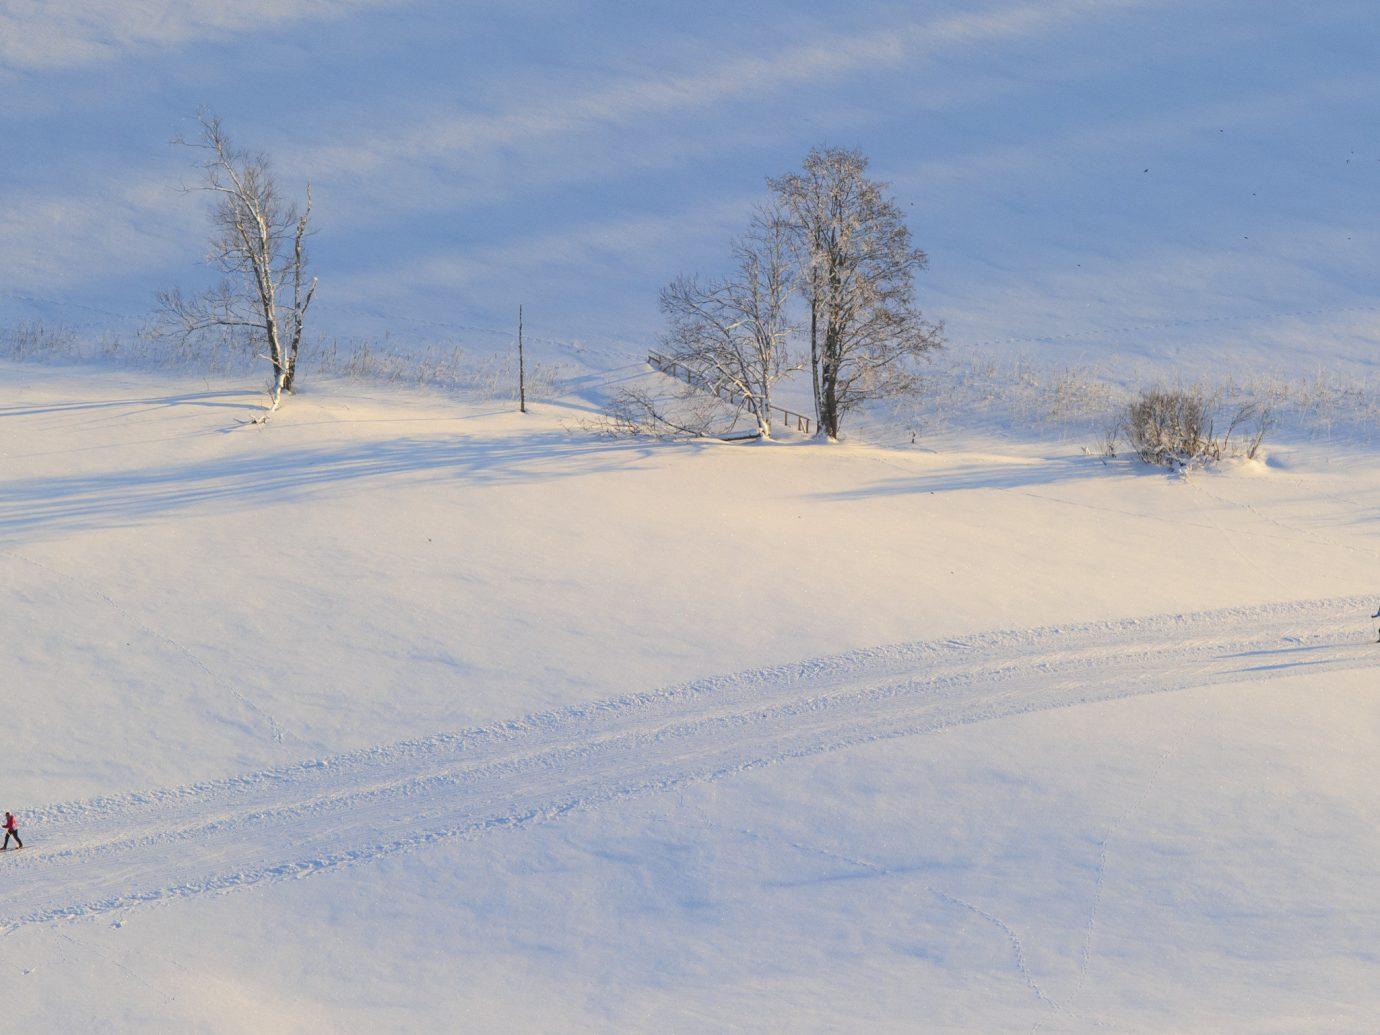 Offbeat snow outdoor sky skiing Winter covered Nature weather piste season geological phenomenon freezing mountain slope hill blizzard ski slope day fresh